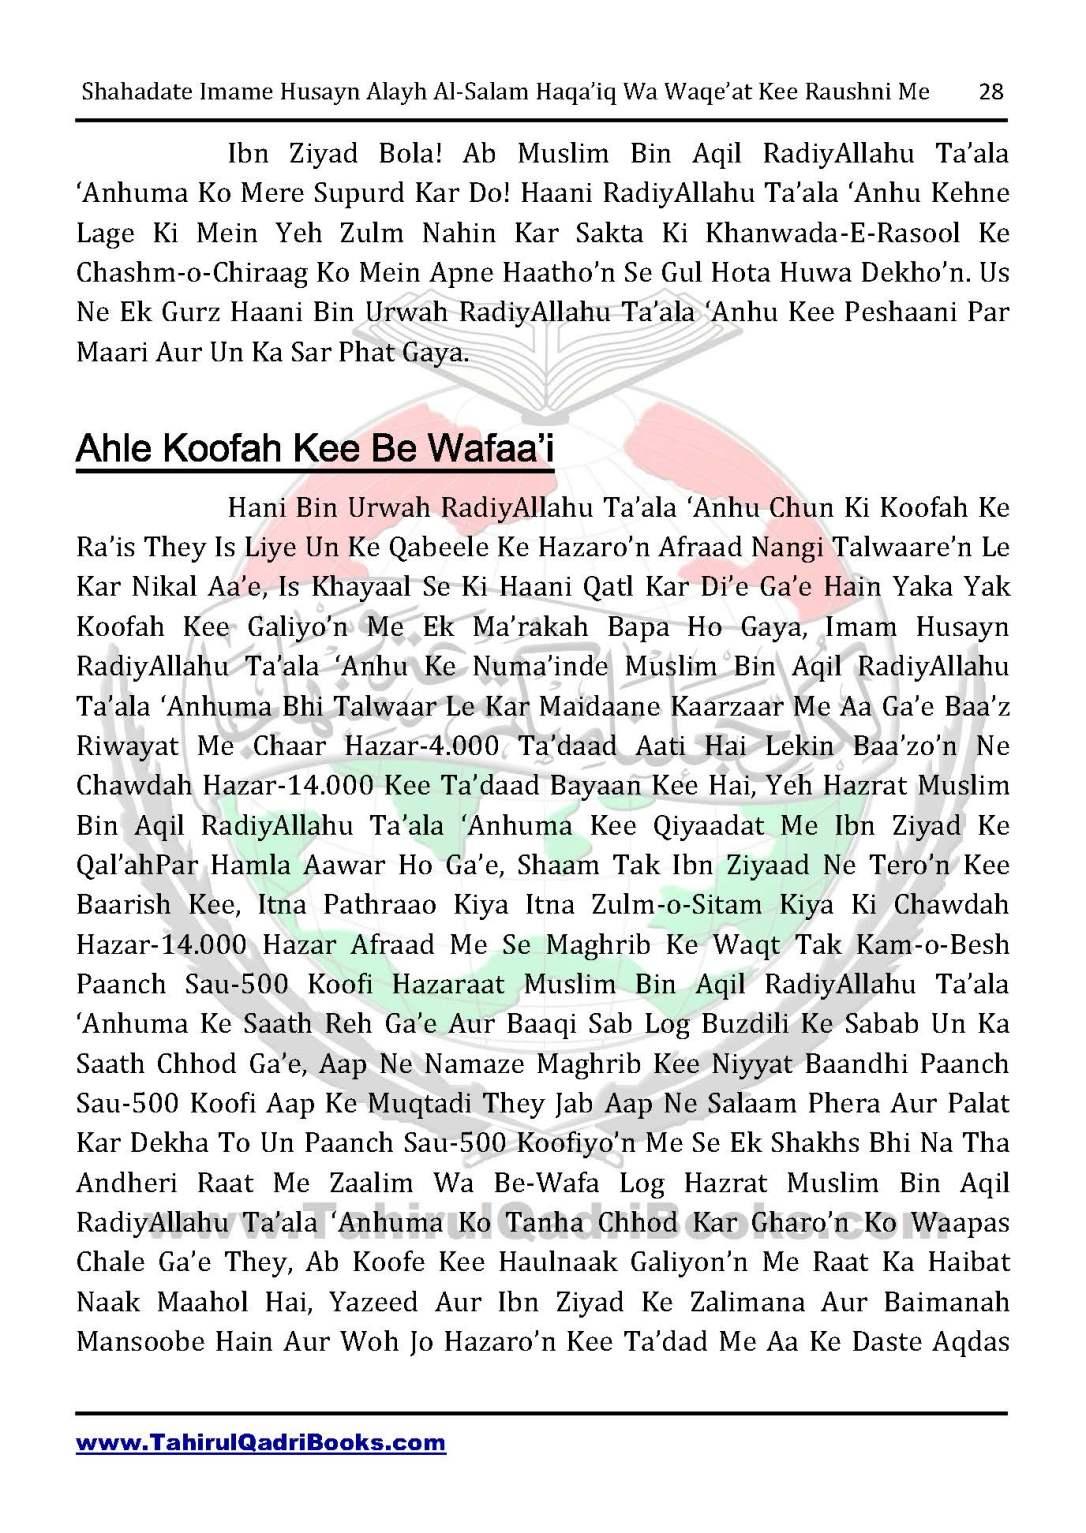 shahadate-imame-husayn-alayh-is-salam-haqaiq-wa-waqe_at-kee-raushni-me-in-roman-urdu-unlocked_Page_28